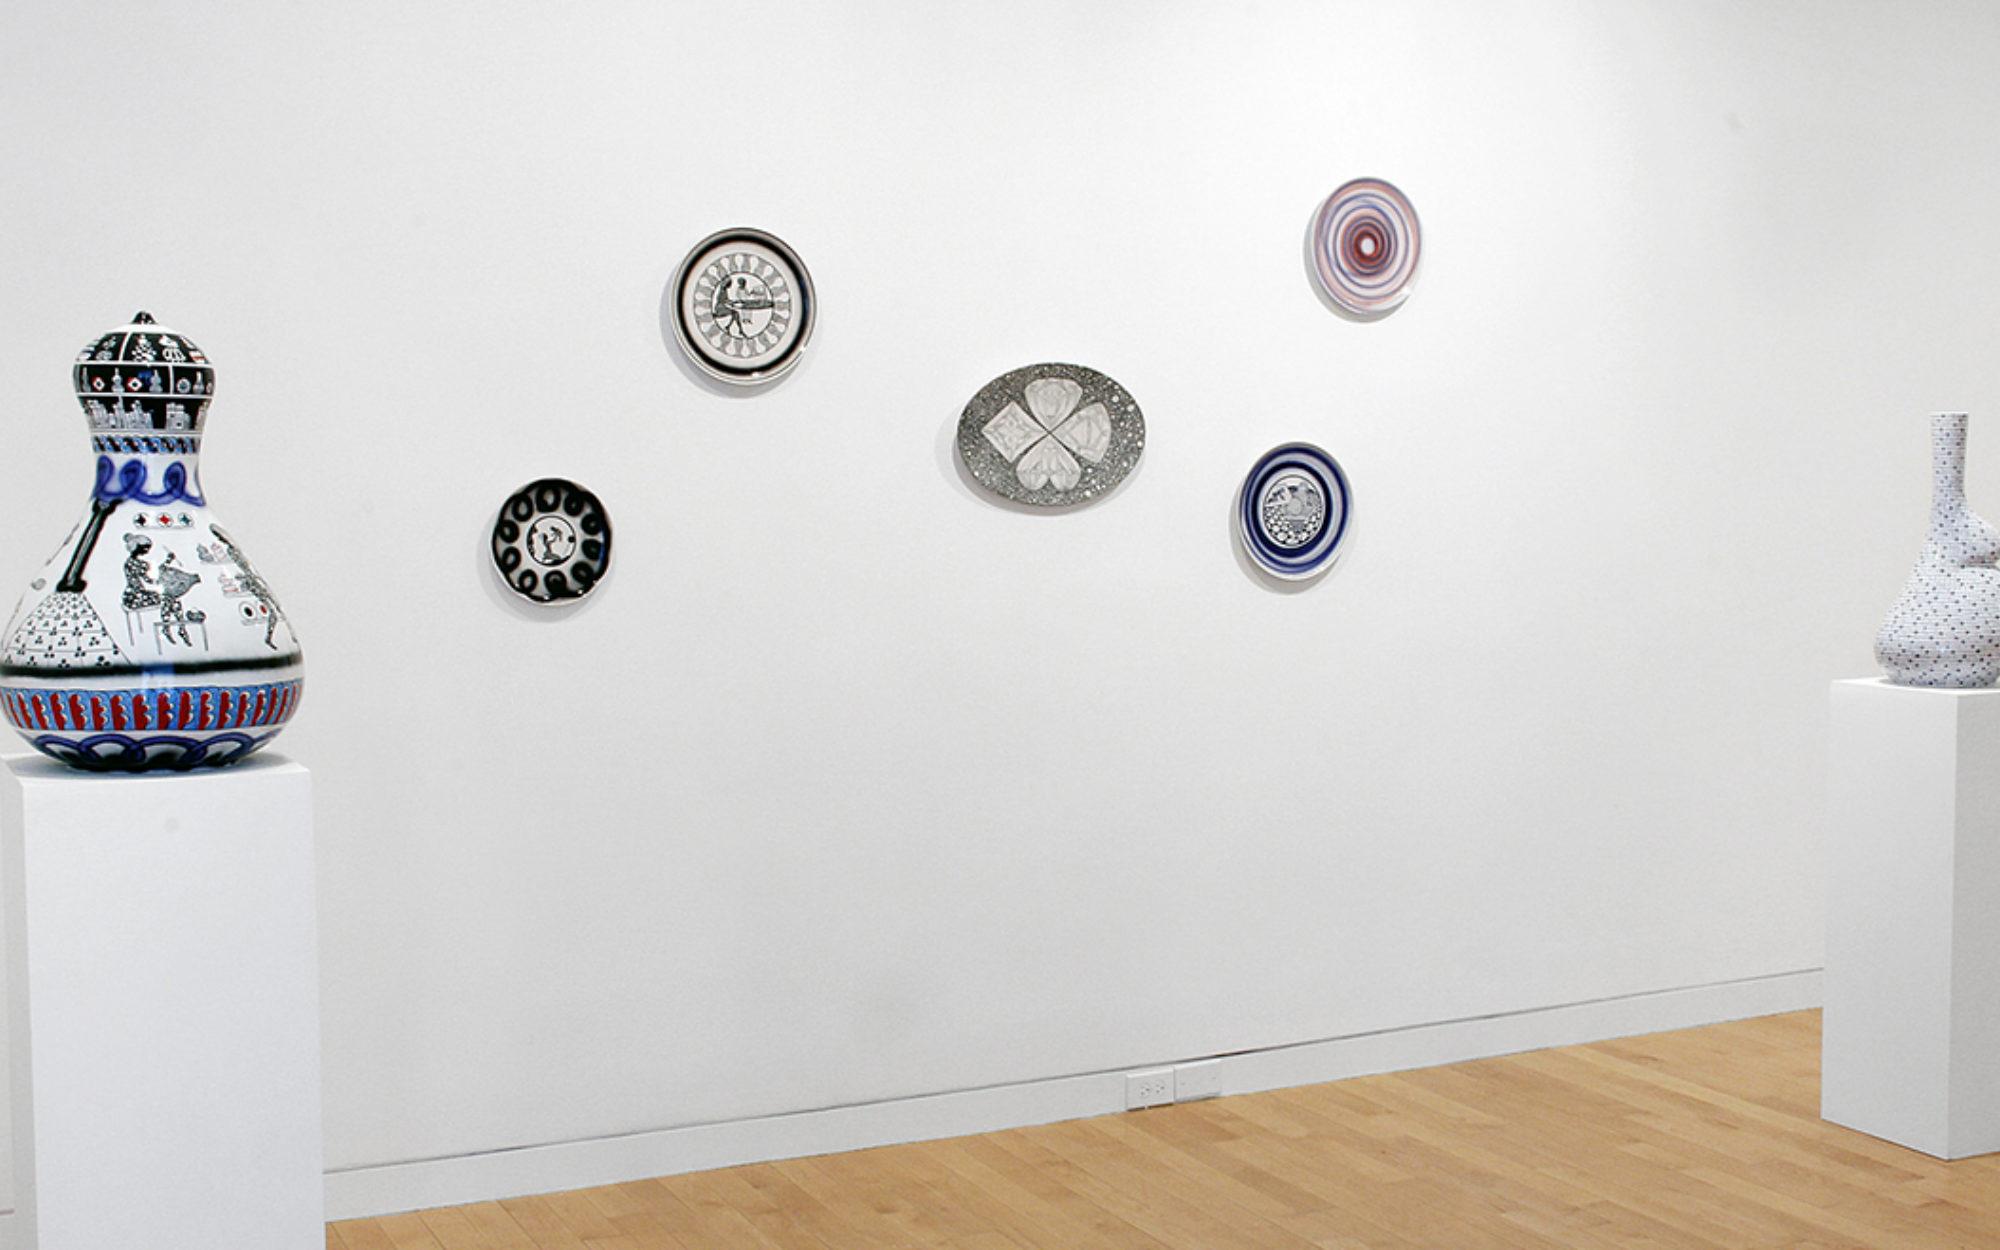 Ceramic vases sit on white pillars, ceramic plates hang on gallery walls